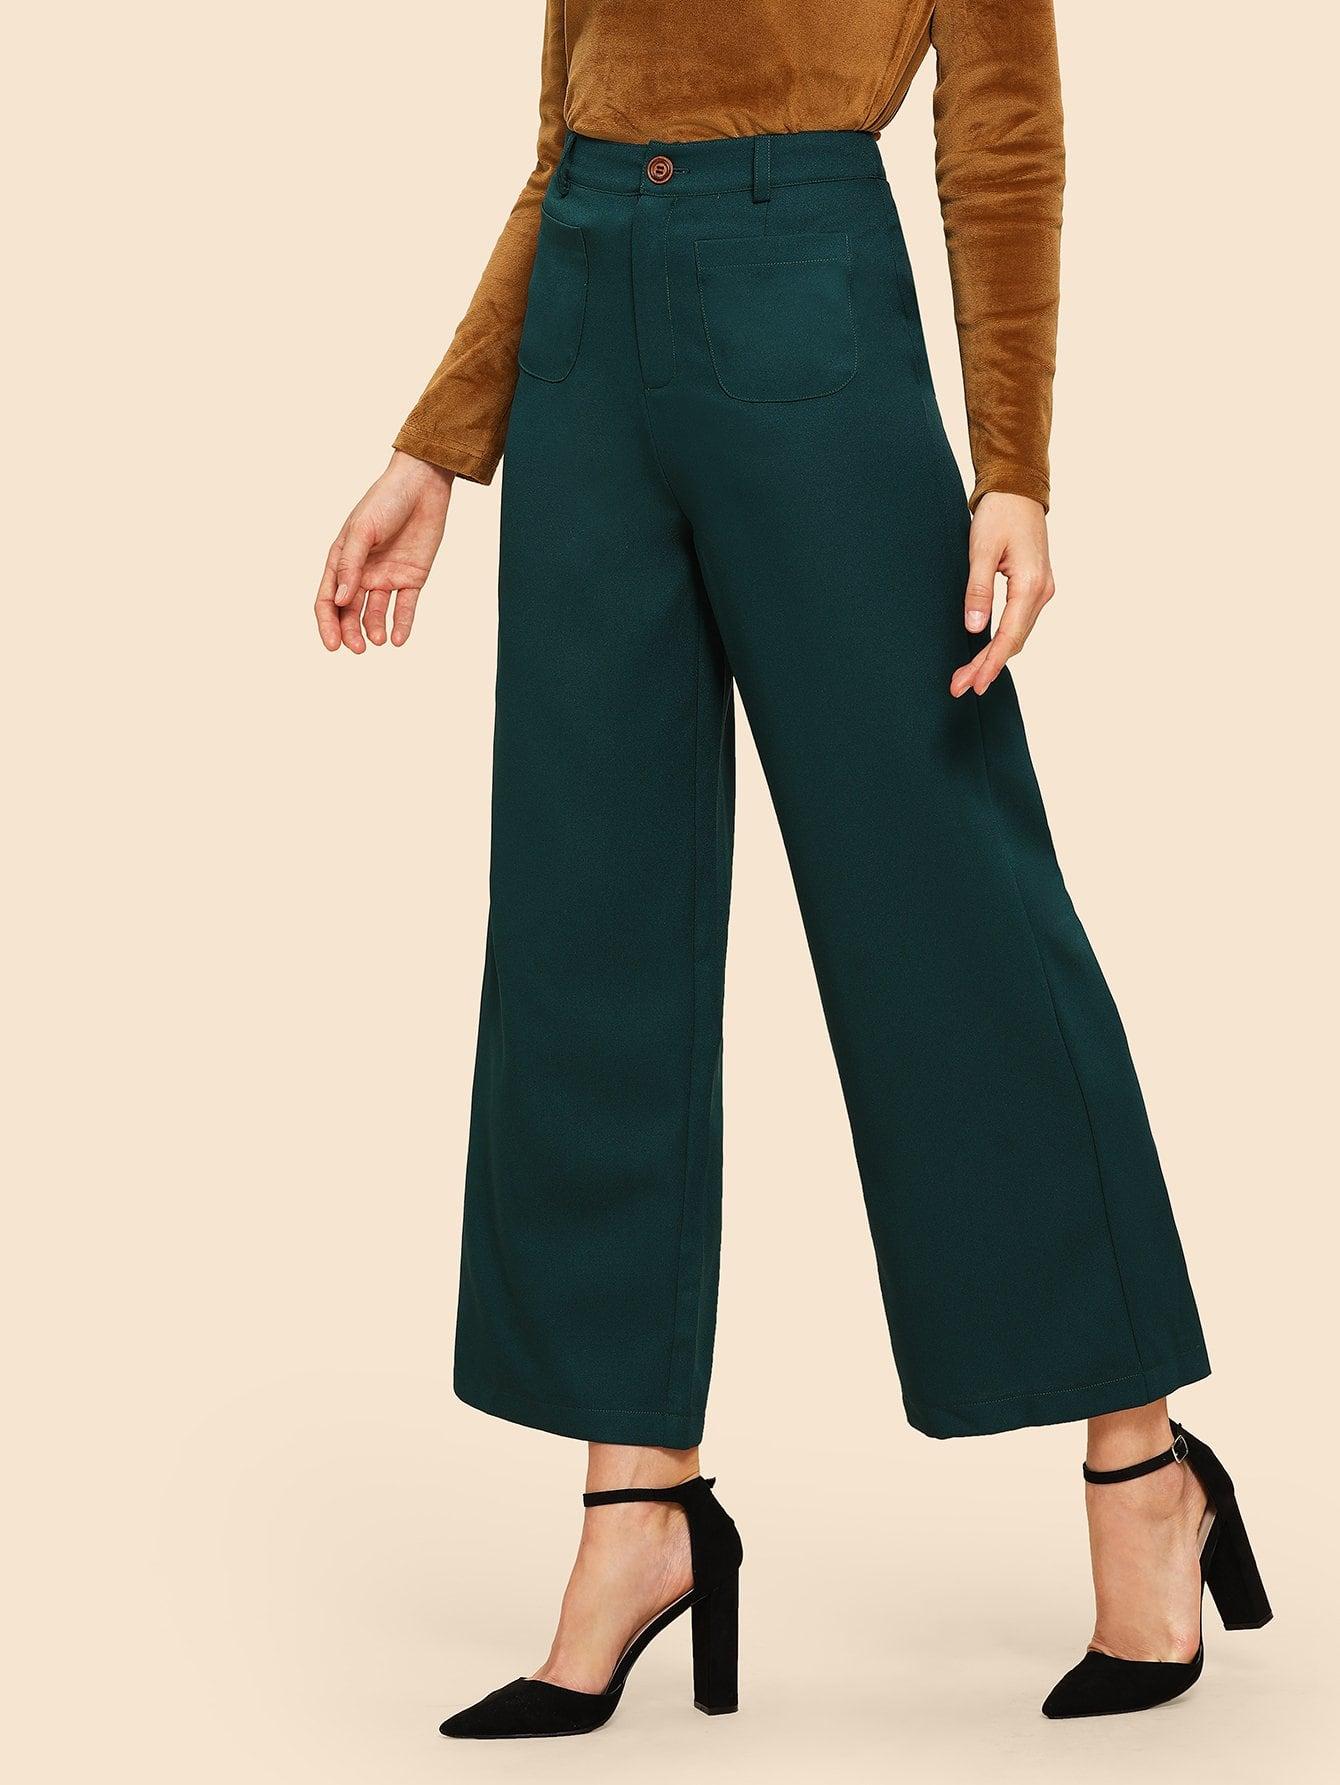 80s Однотонные брюки с карманами thumbnail